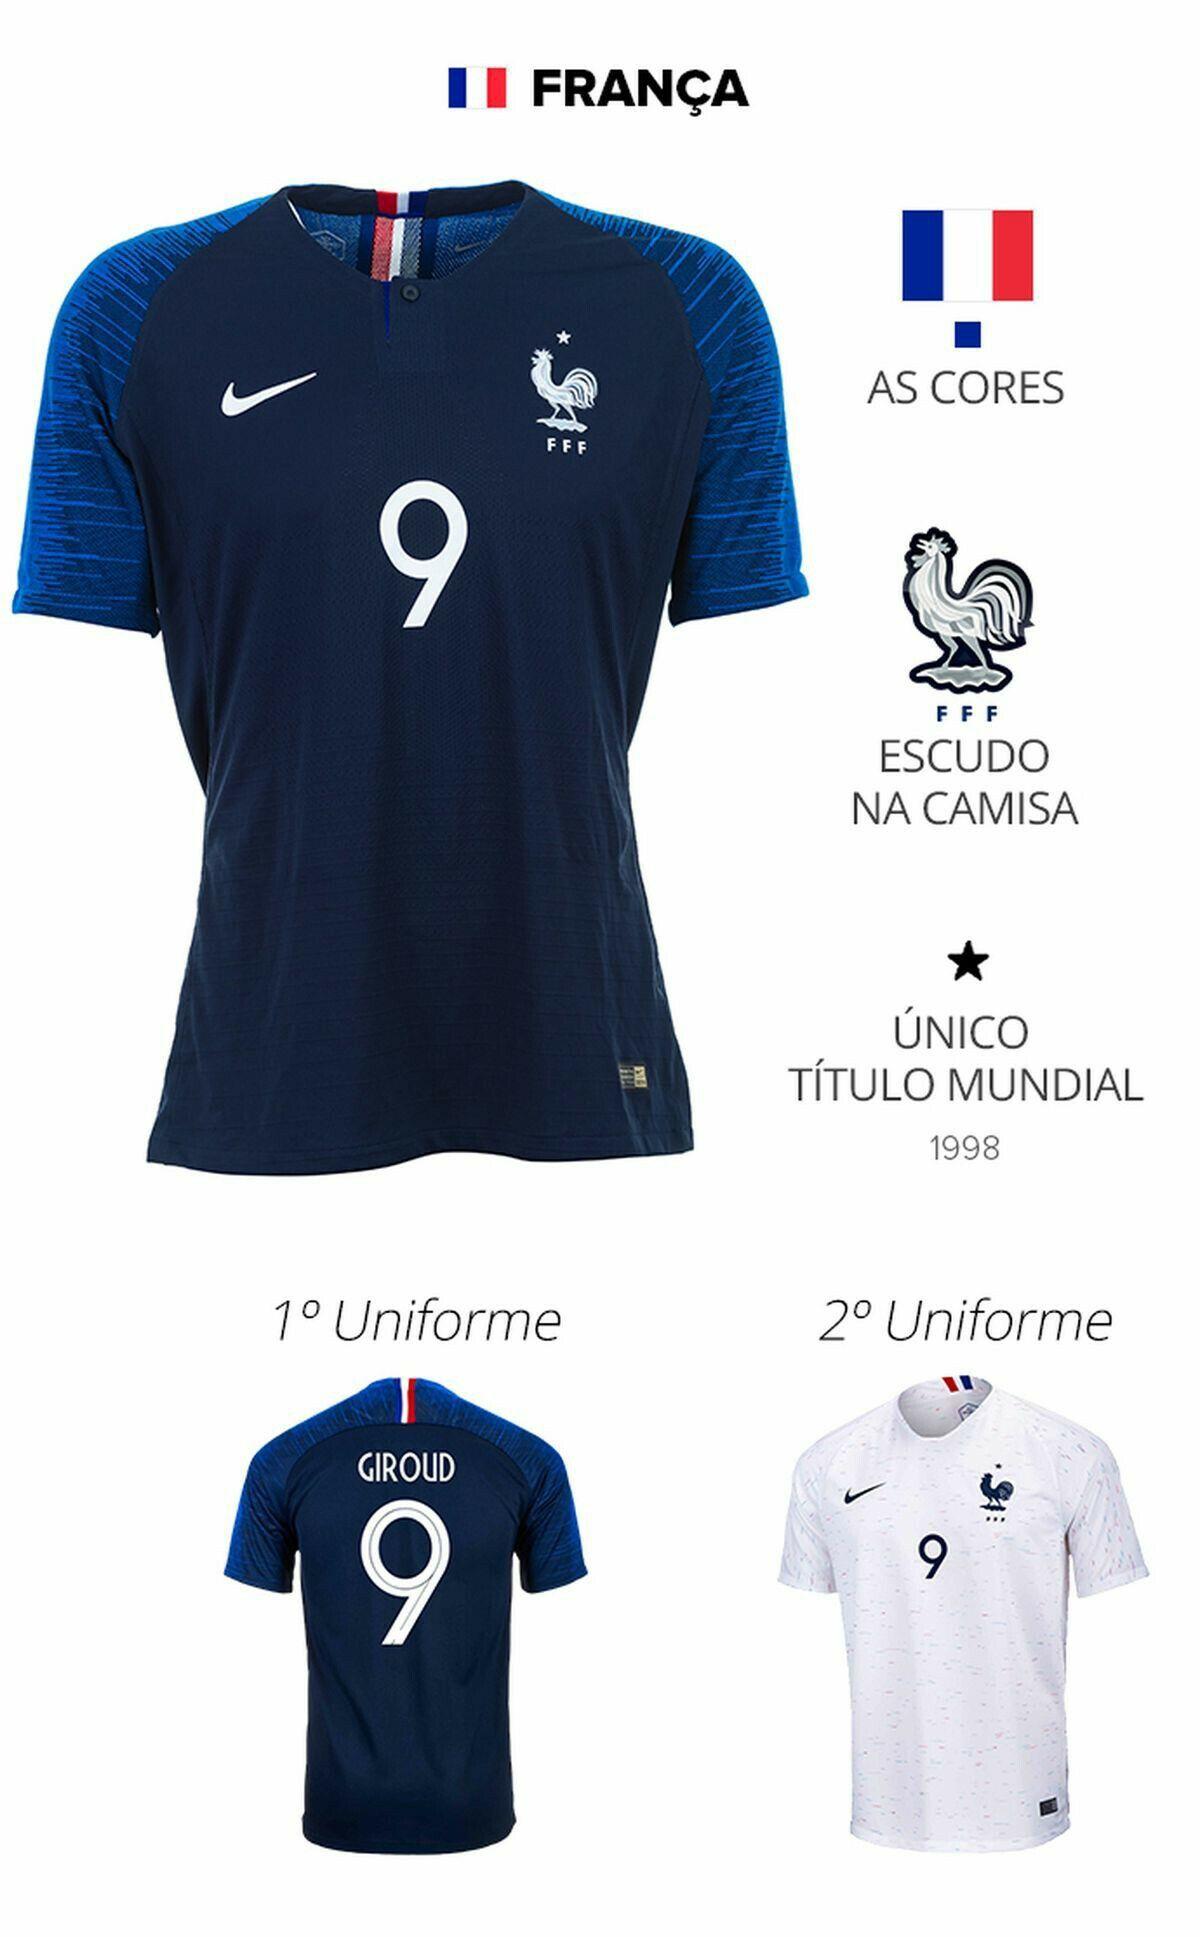 França Camisa Da França 96f3cdc08aa89